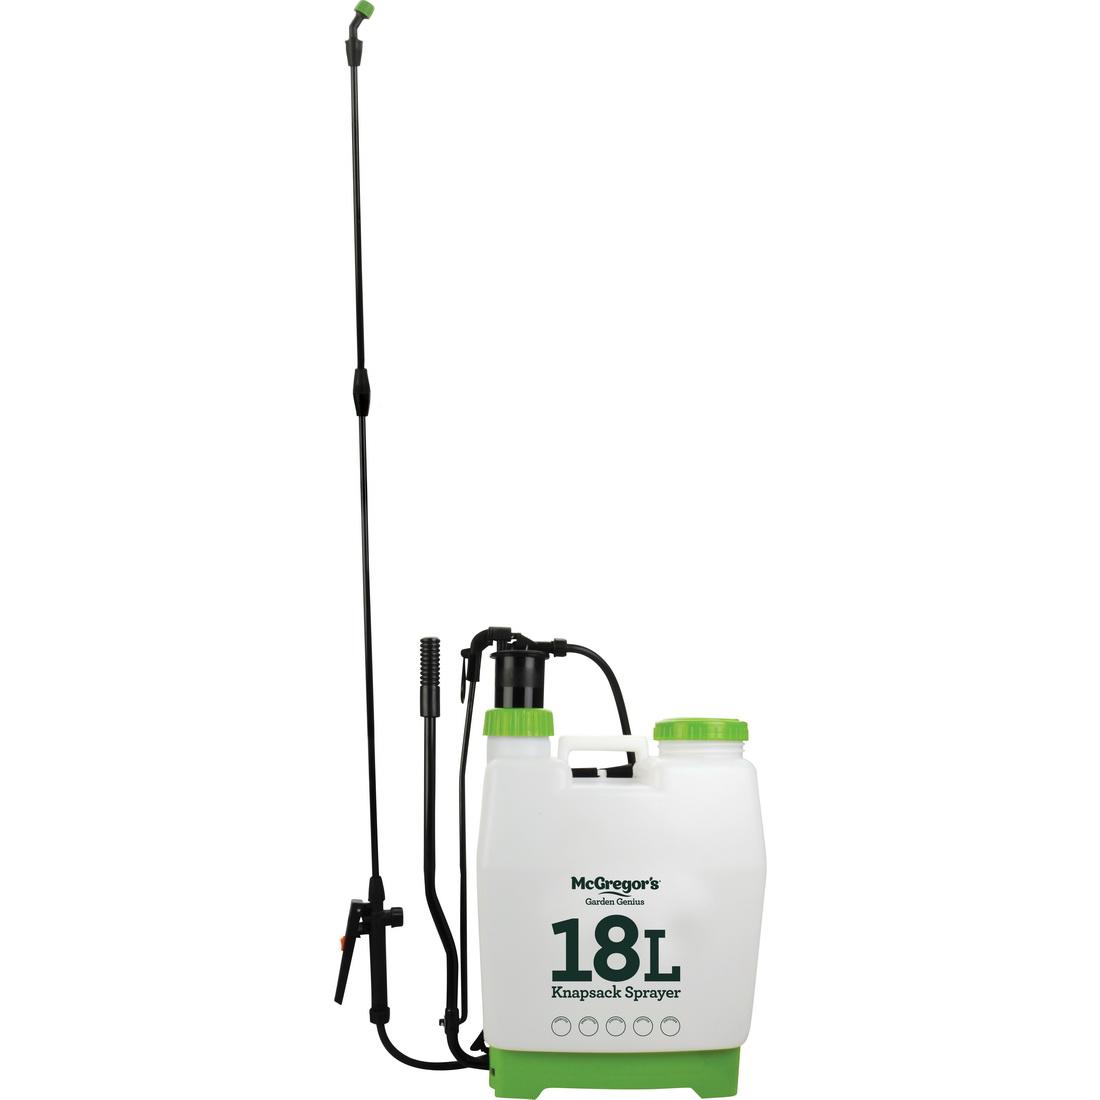 18L Knapsack Sprayer